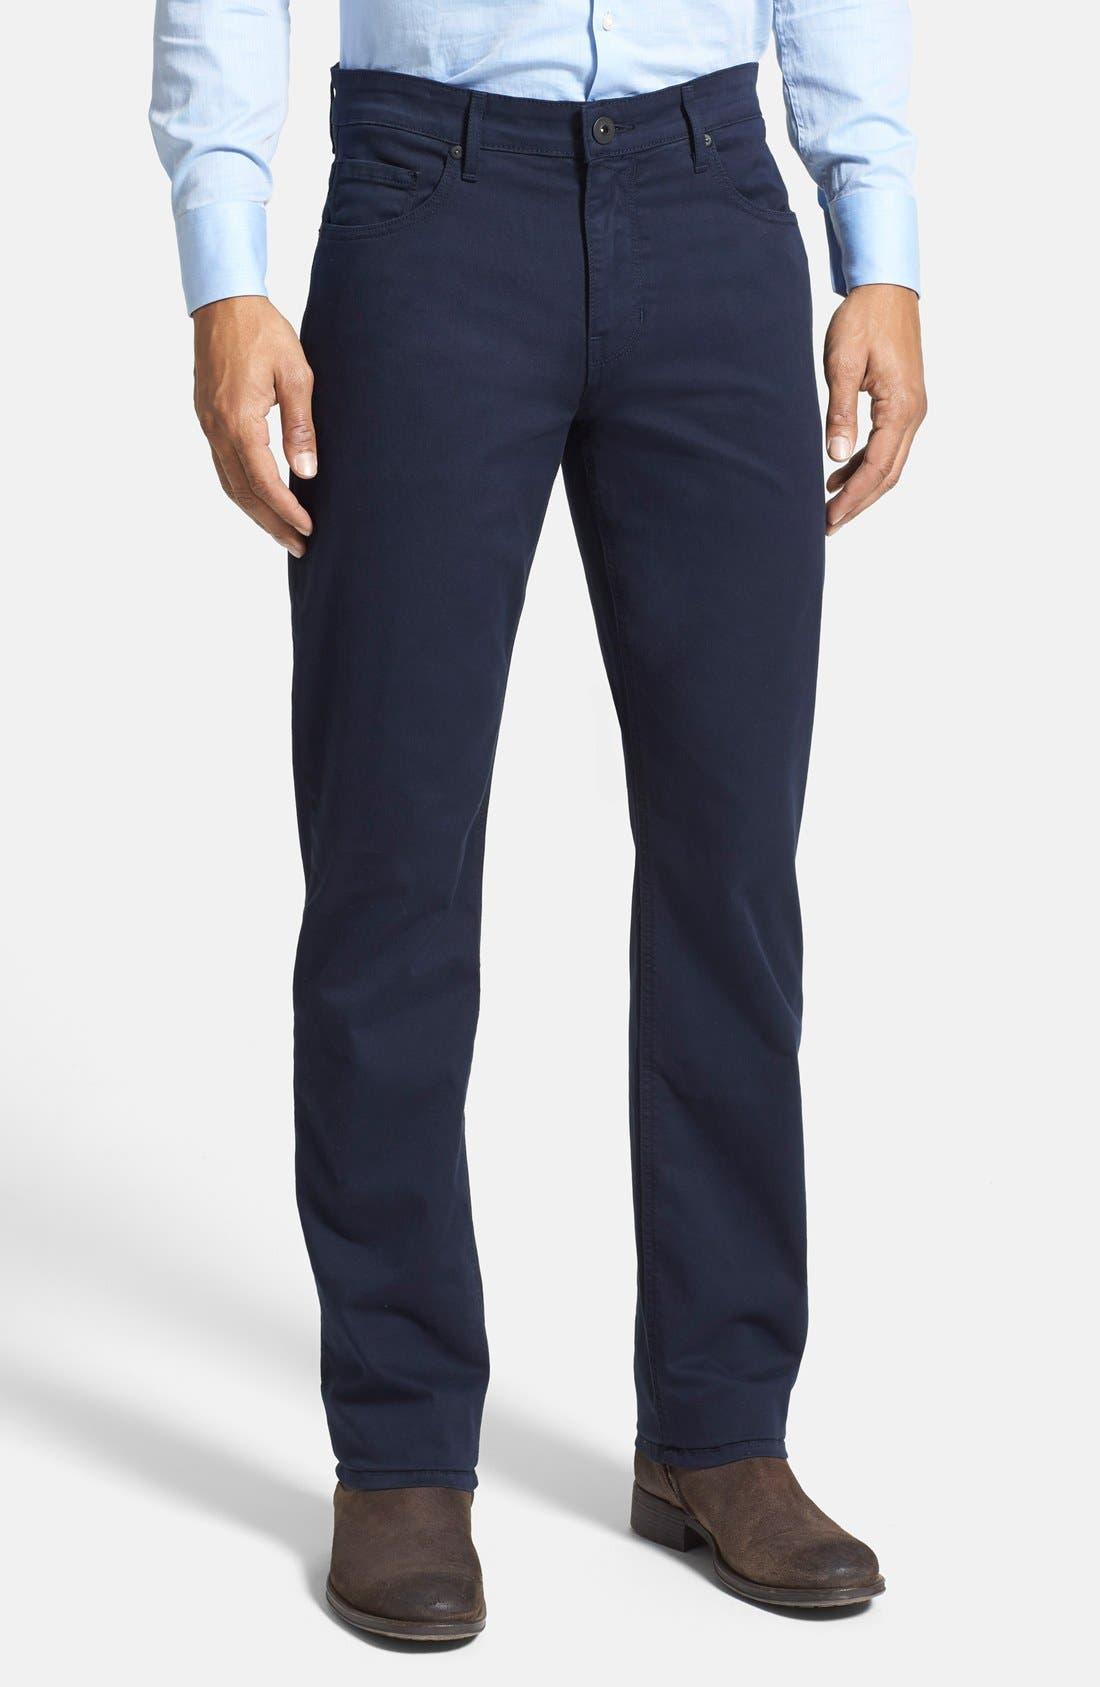 PAIGE, Normandie Slim Straight Leg Twill Pants, Main thumbnail 1, color, NAVY CADET